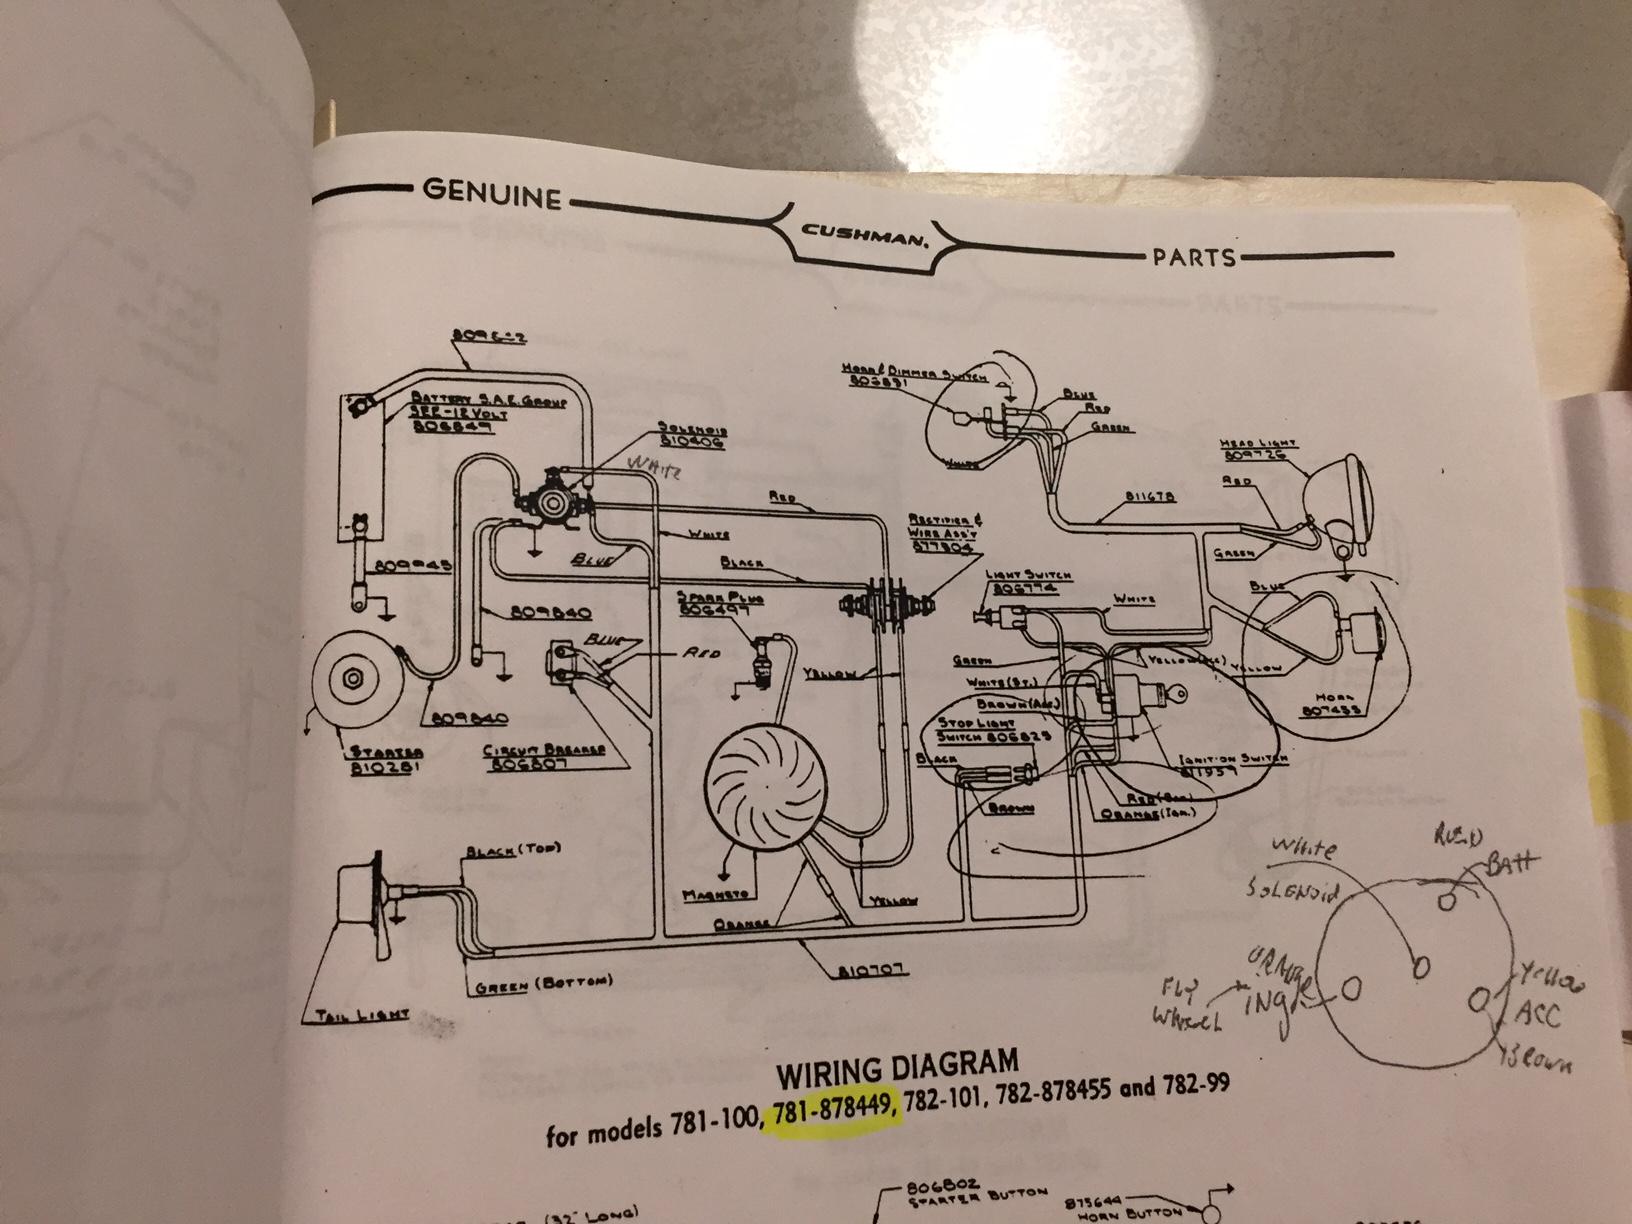 cushman cart wiring diagram 2000 cushman eagle wiring diagram wiring diagram  cushman eagle wiring diagram wiring